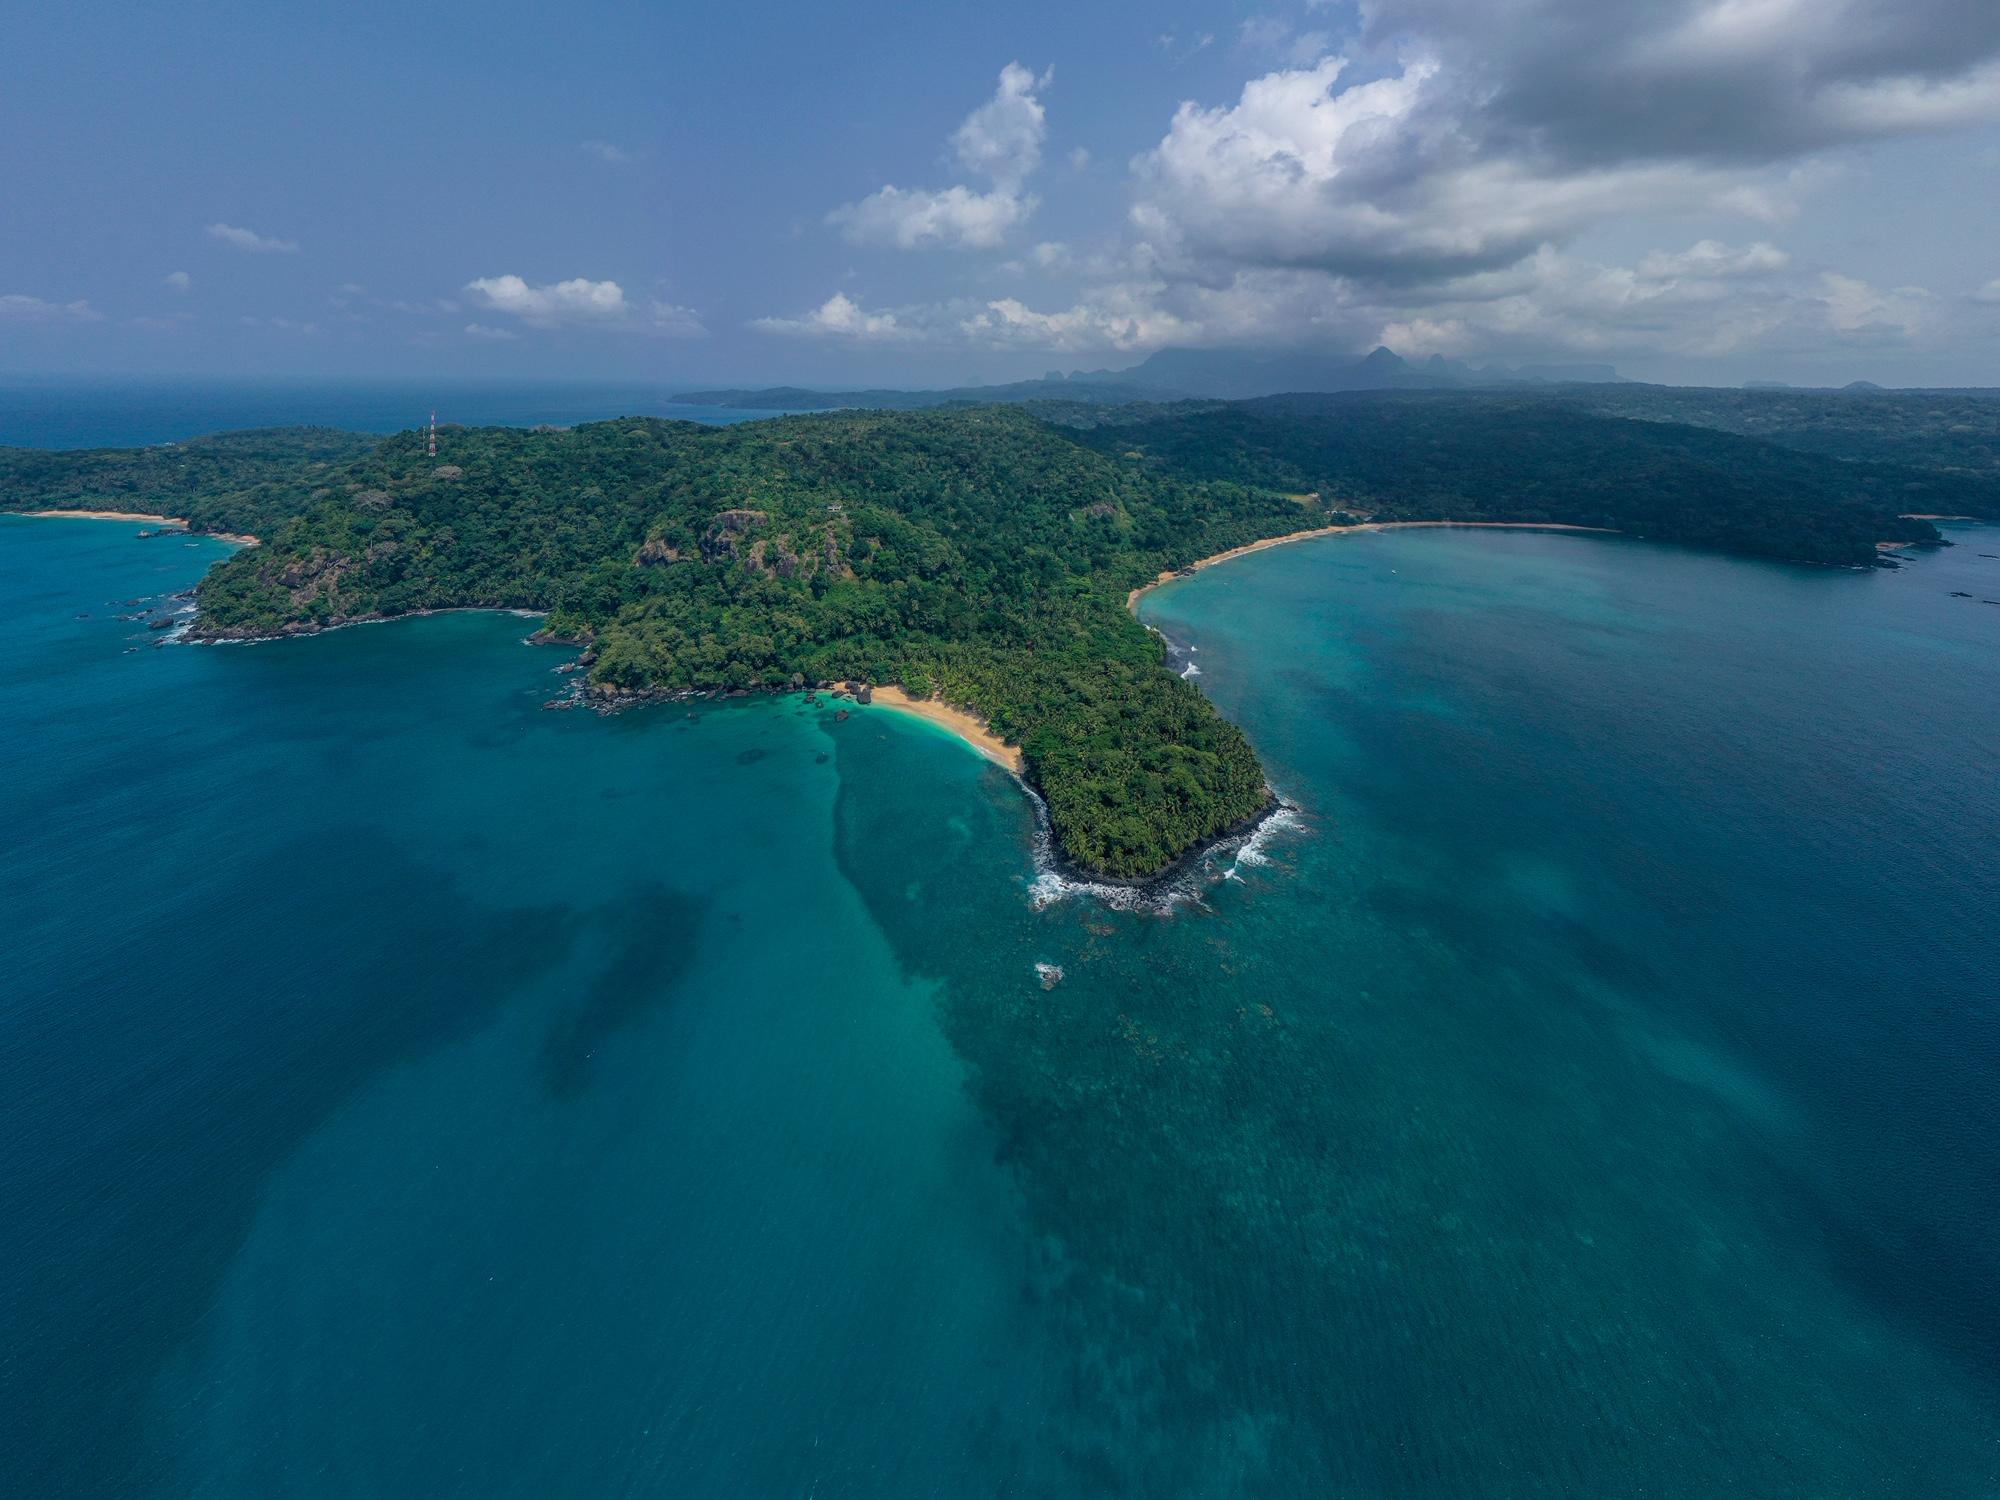 Vista aérea da ilha do Príncipe.  Photo credits  @fredericovanzeller